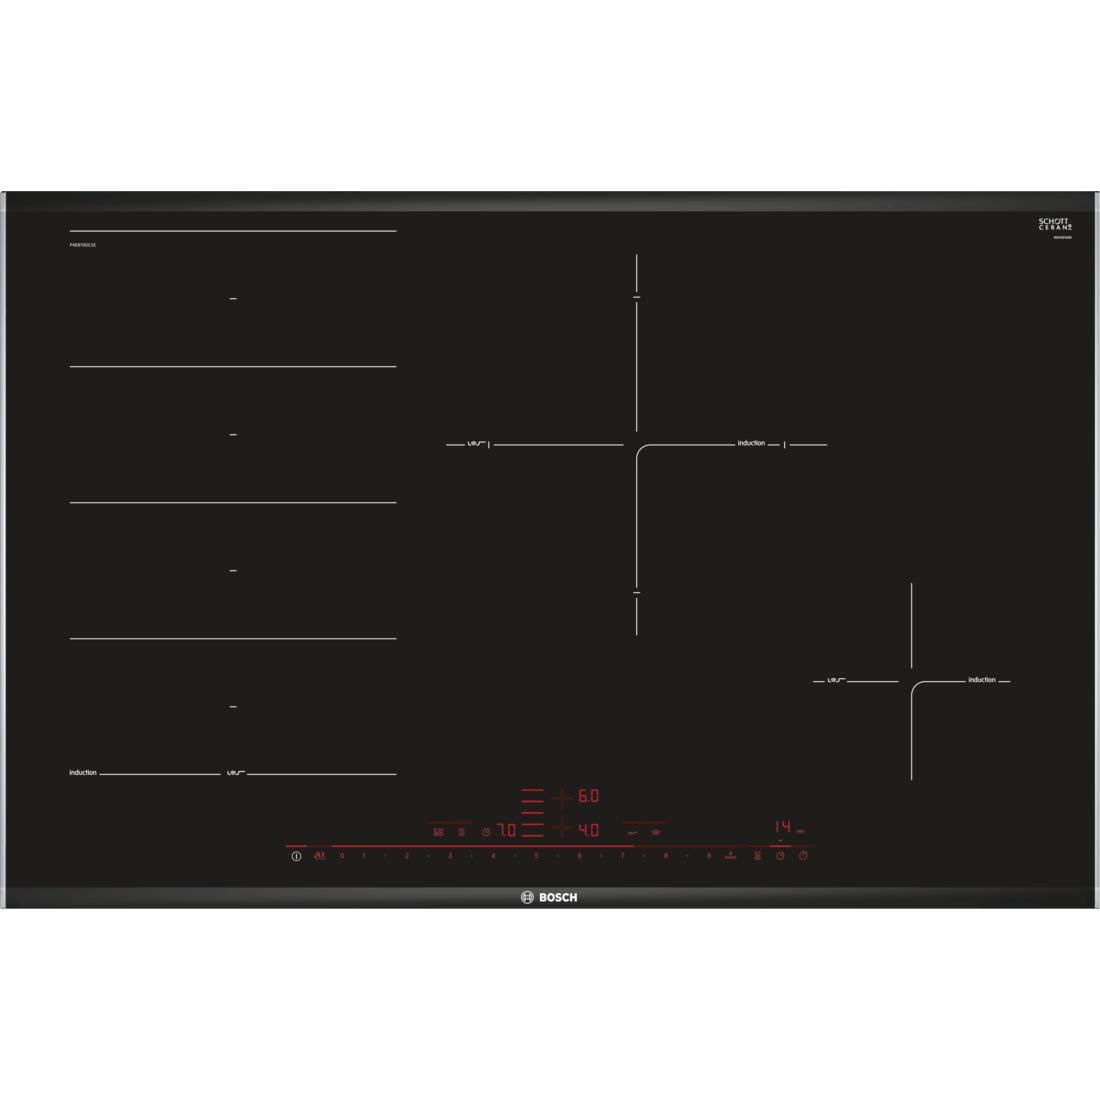 bosch 80cm series 8 black ceramic glass induction cooktop. Black Bedroom Furniture Sets. Home Design Ideas